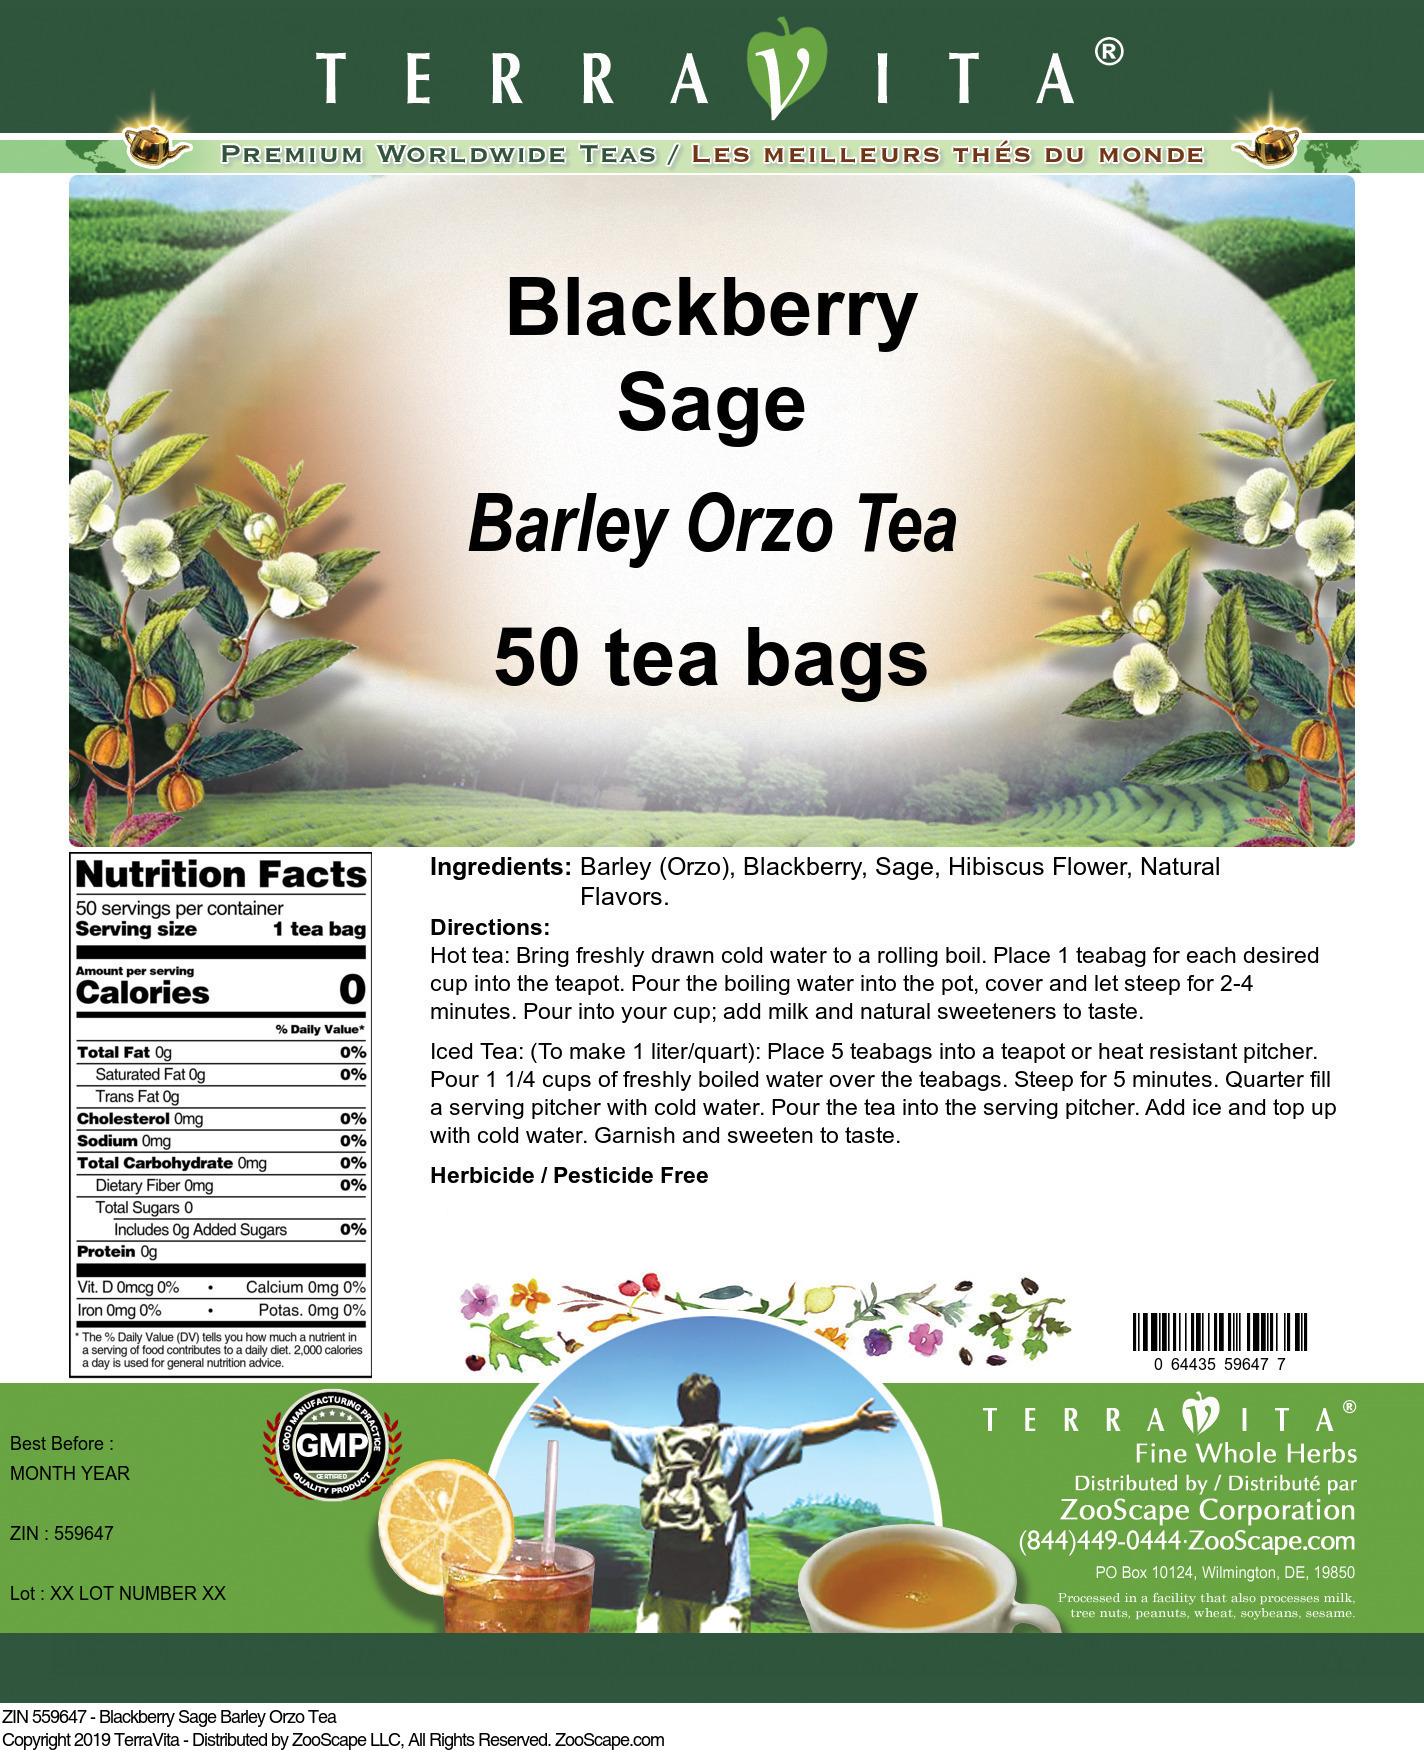 Blackberry Sage Barley Orzo Tea